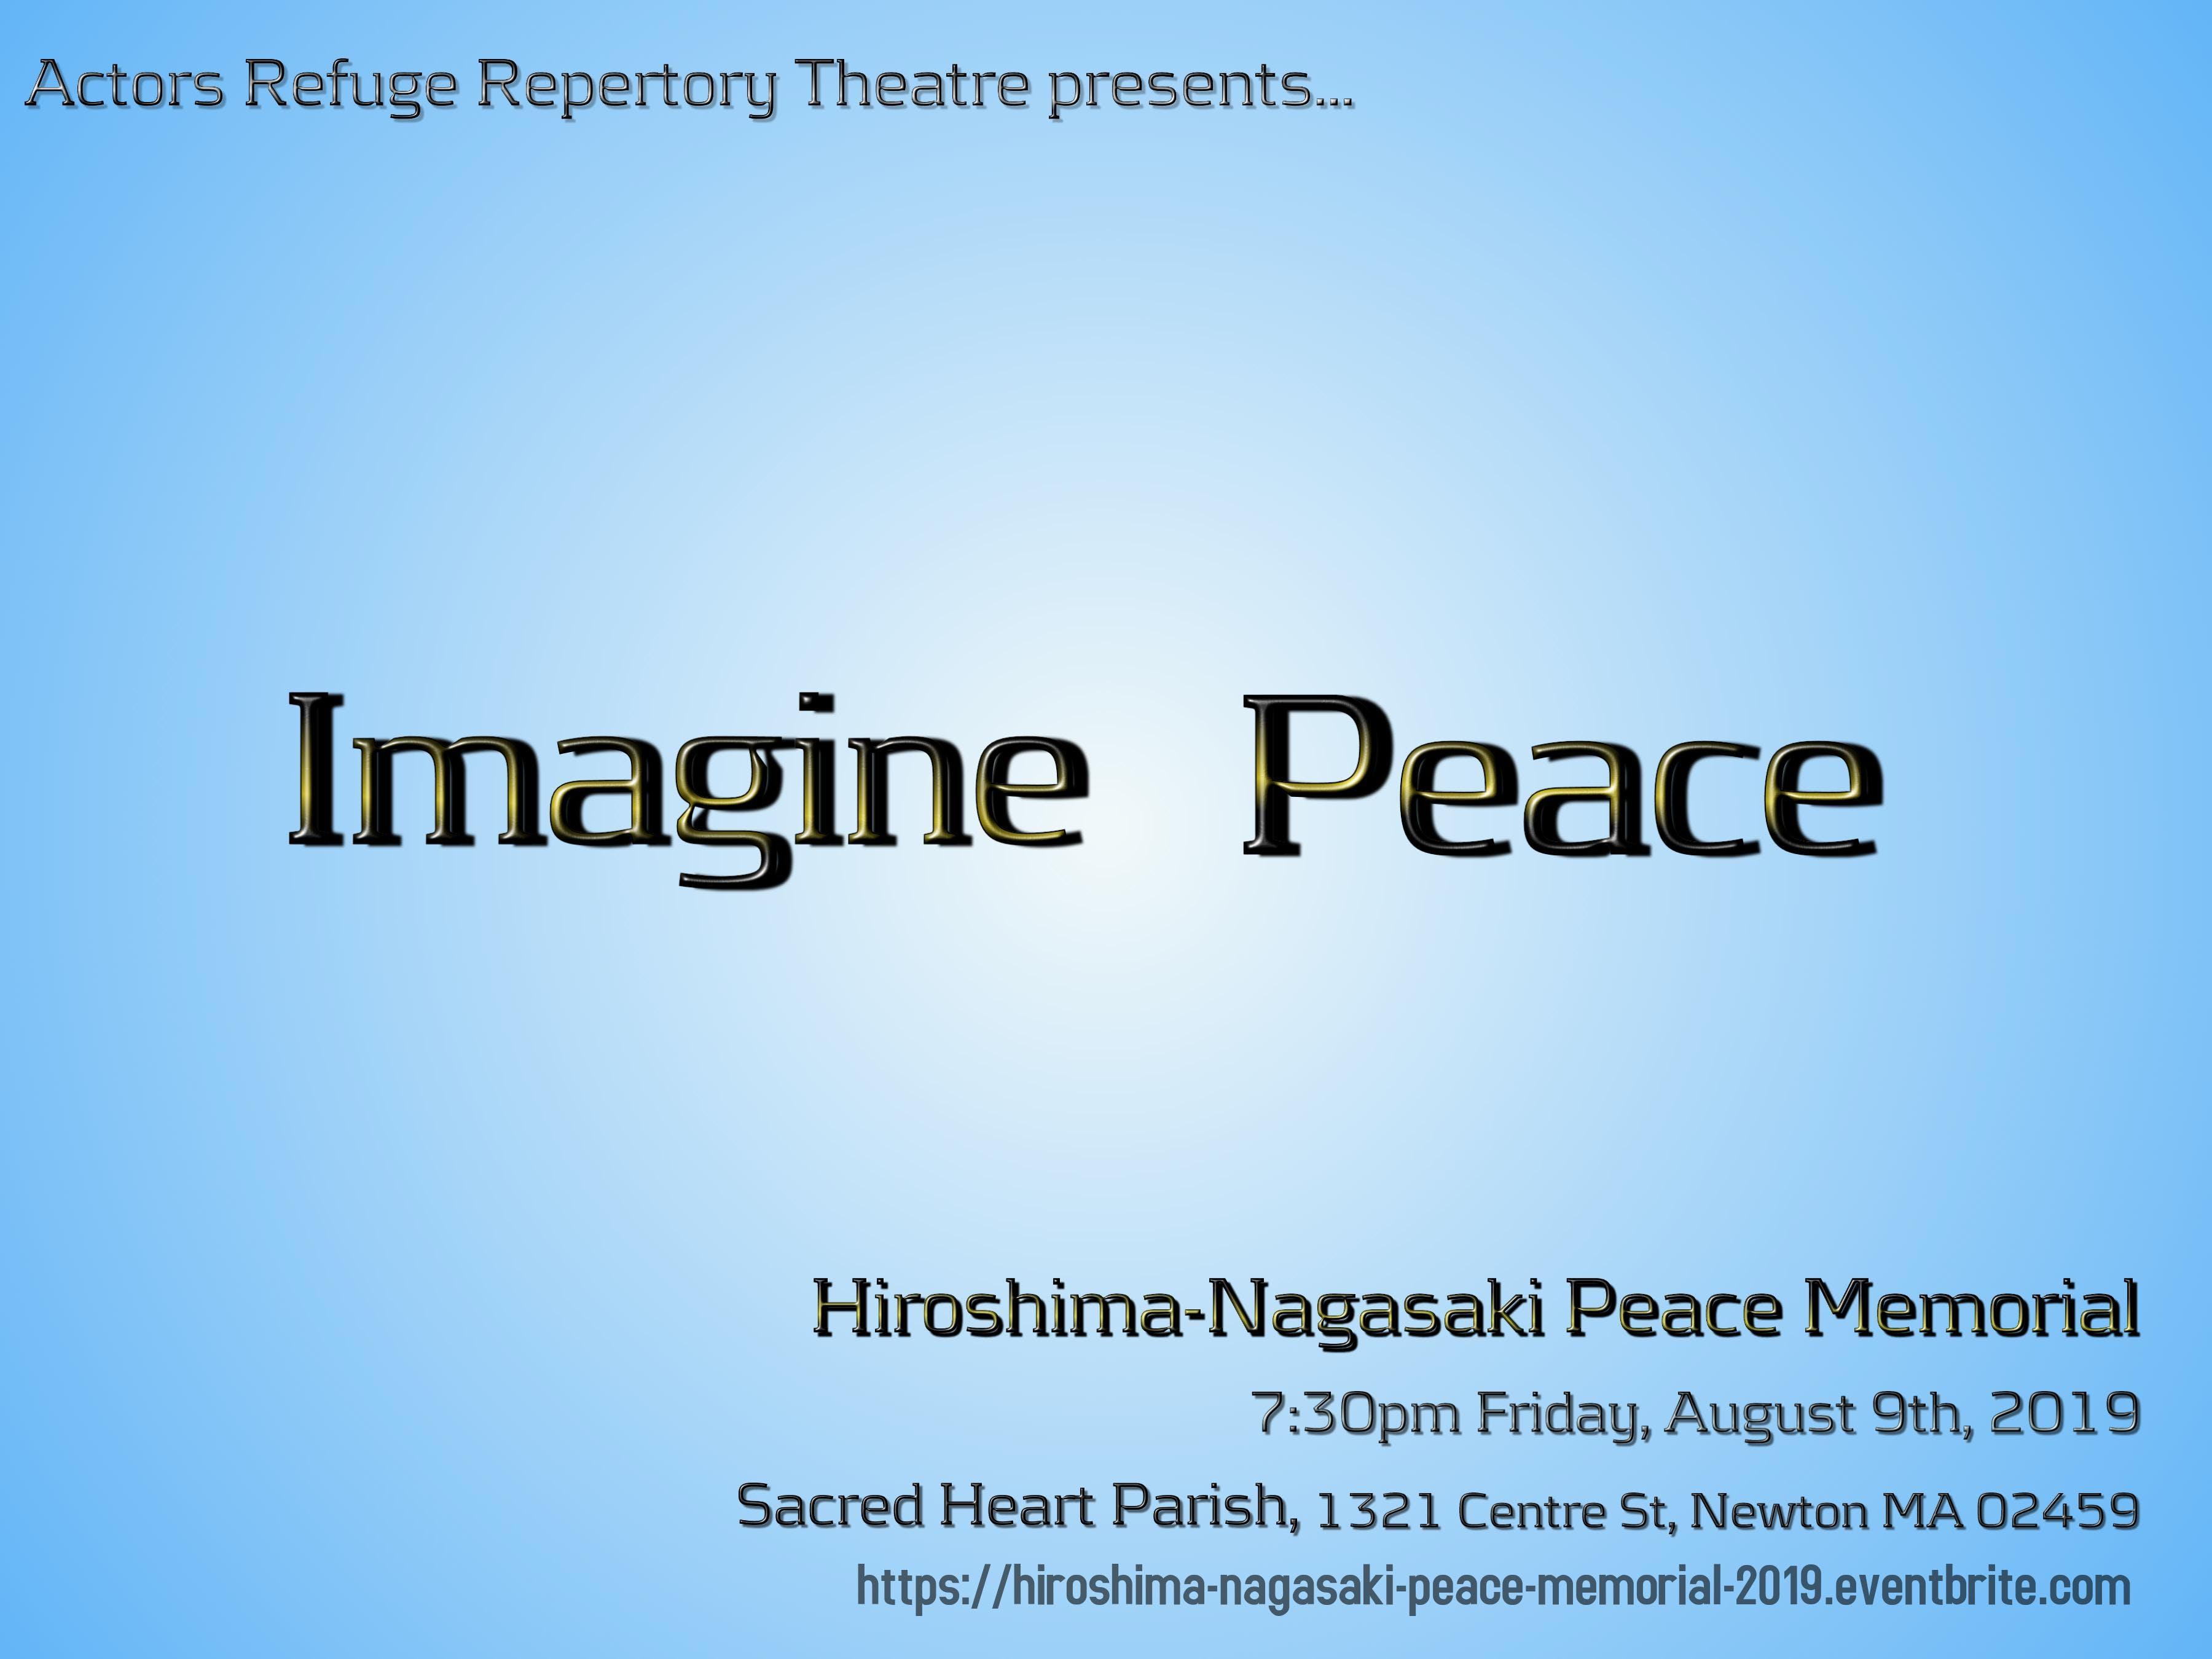 Hiroshima-Nagasaki Peace Memorial 2019 - Ournewton org